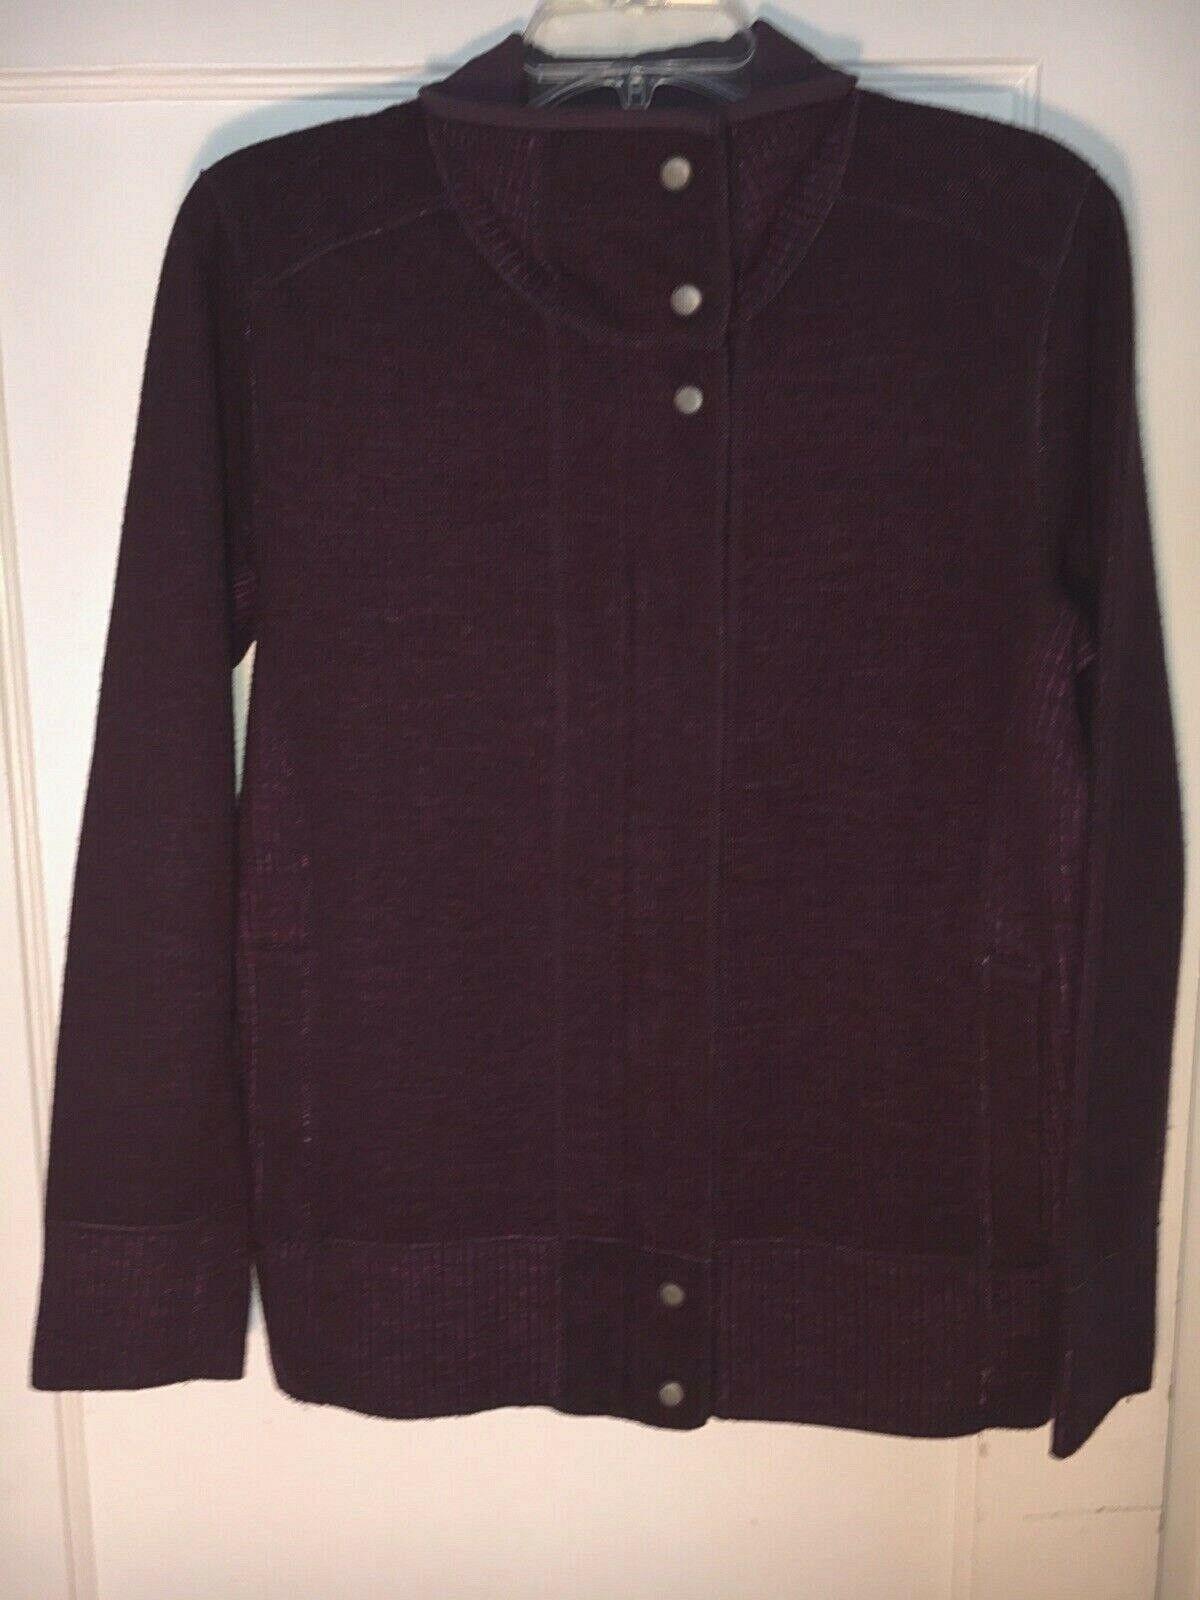 Title Nine lila Wolle blend zip snap Swacket Cardigan sweater jacket L. A495